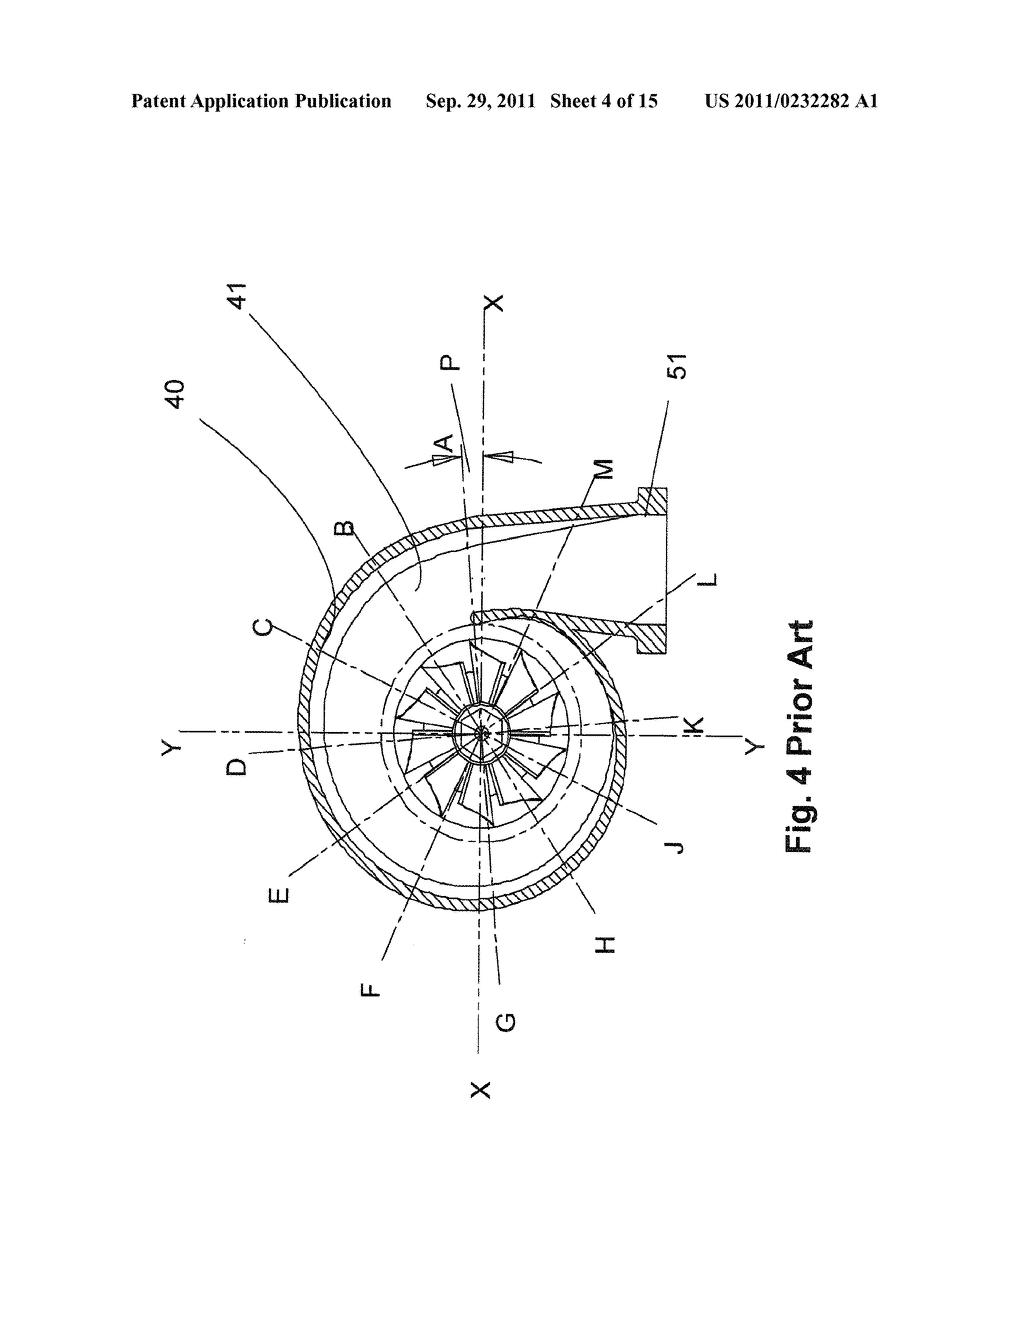 cessna 406 diagram three phase motor star delta wiring aircraft parts lights elsavadorla